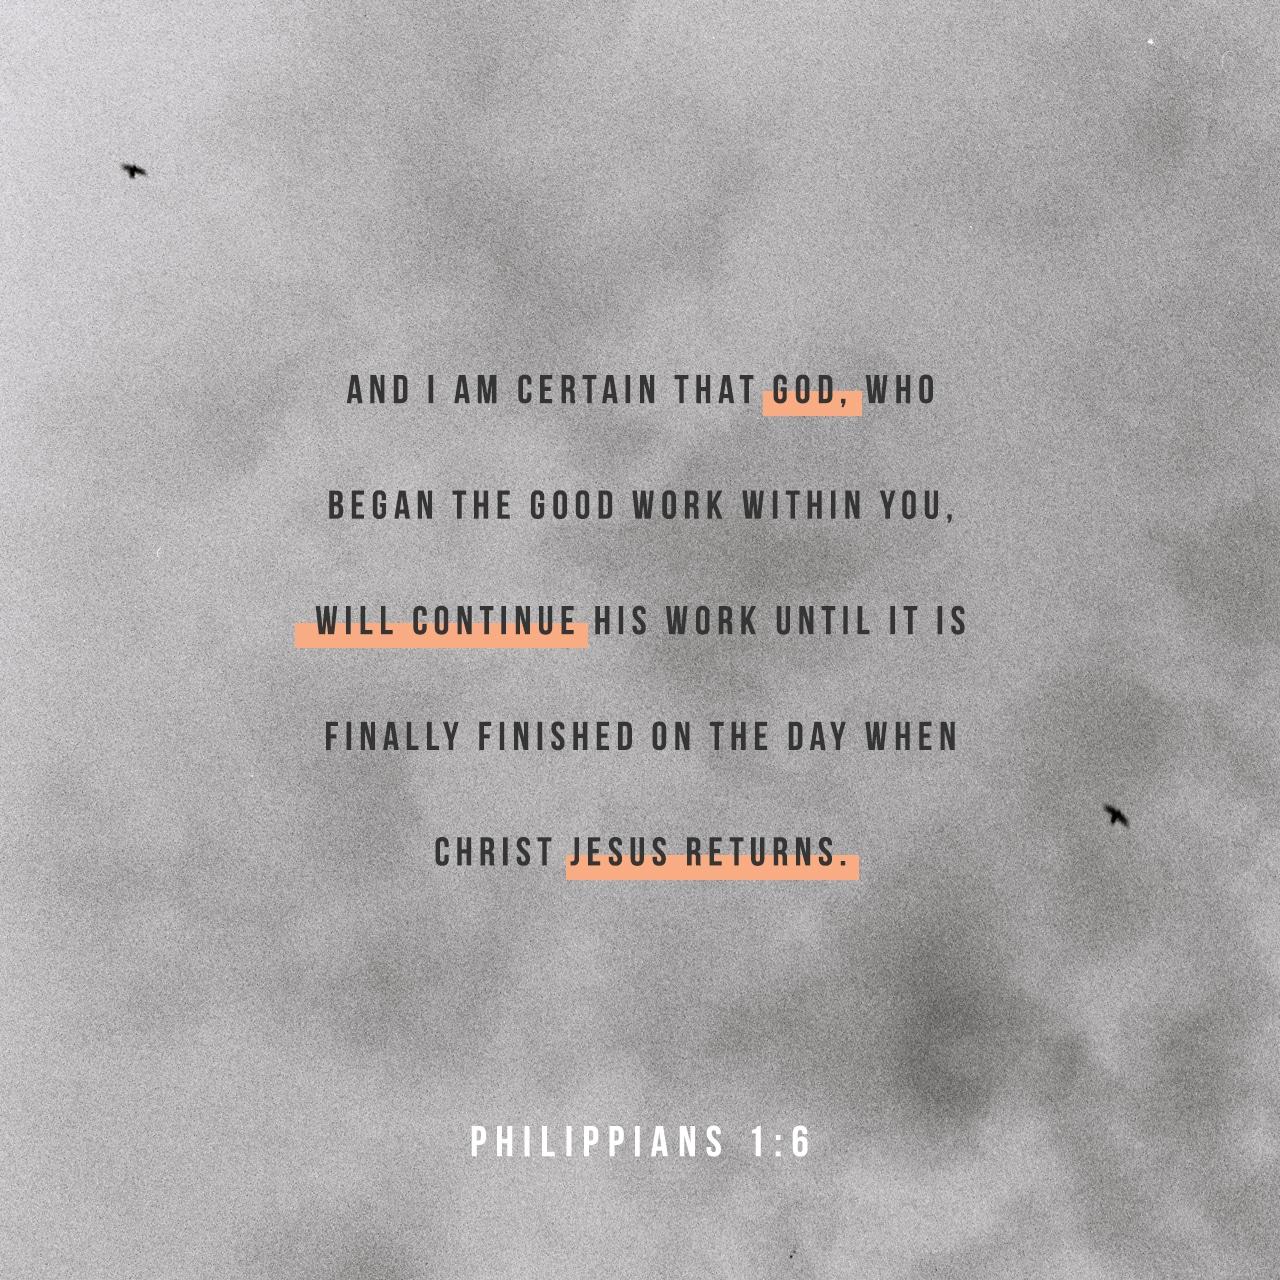 philippians 1 6 creative scripture art free church resources